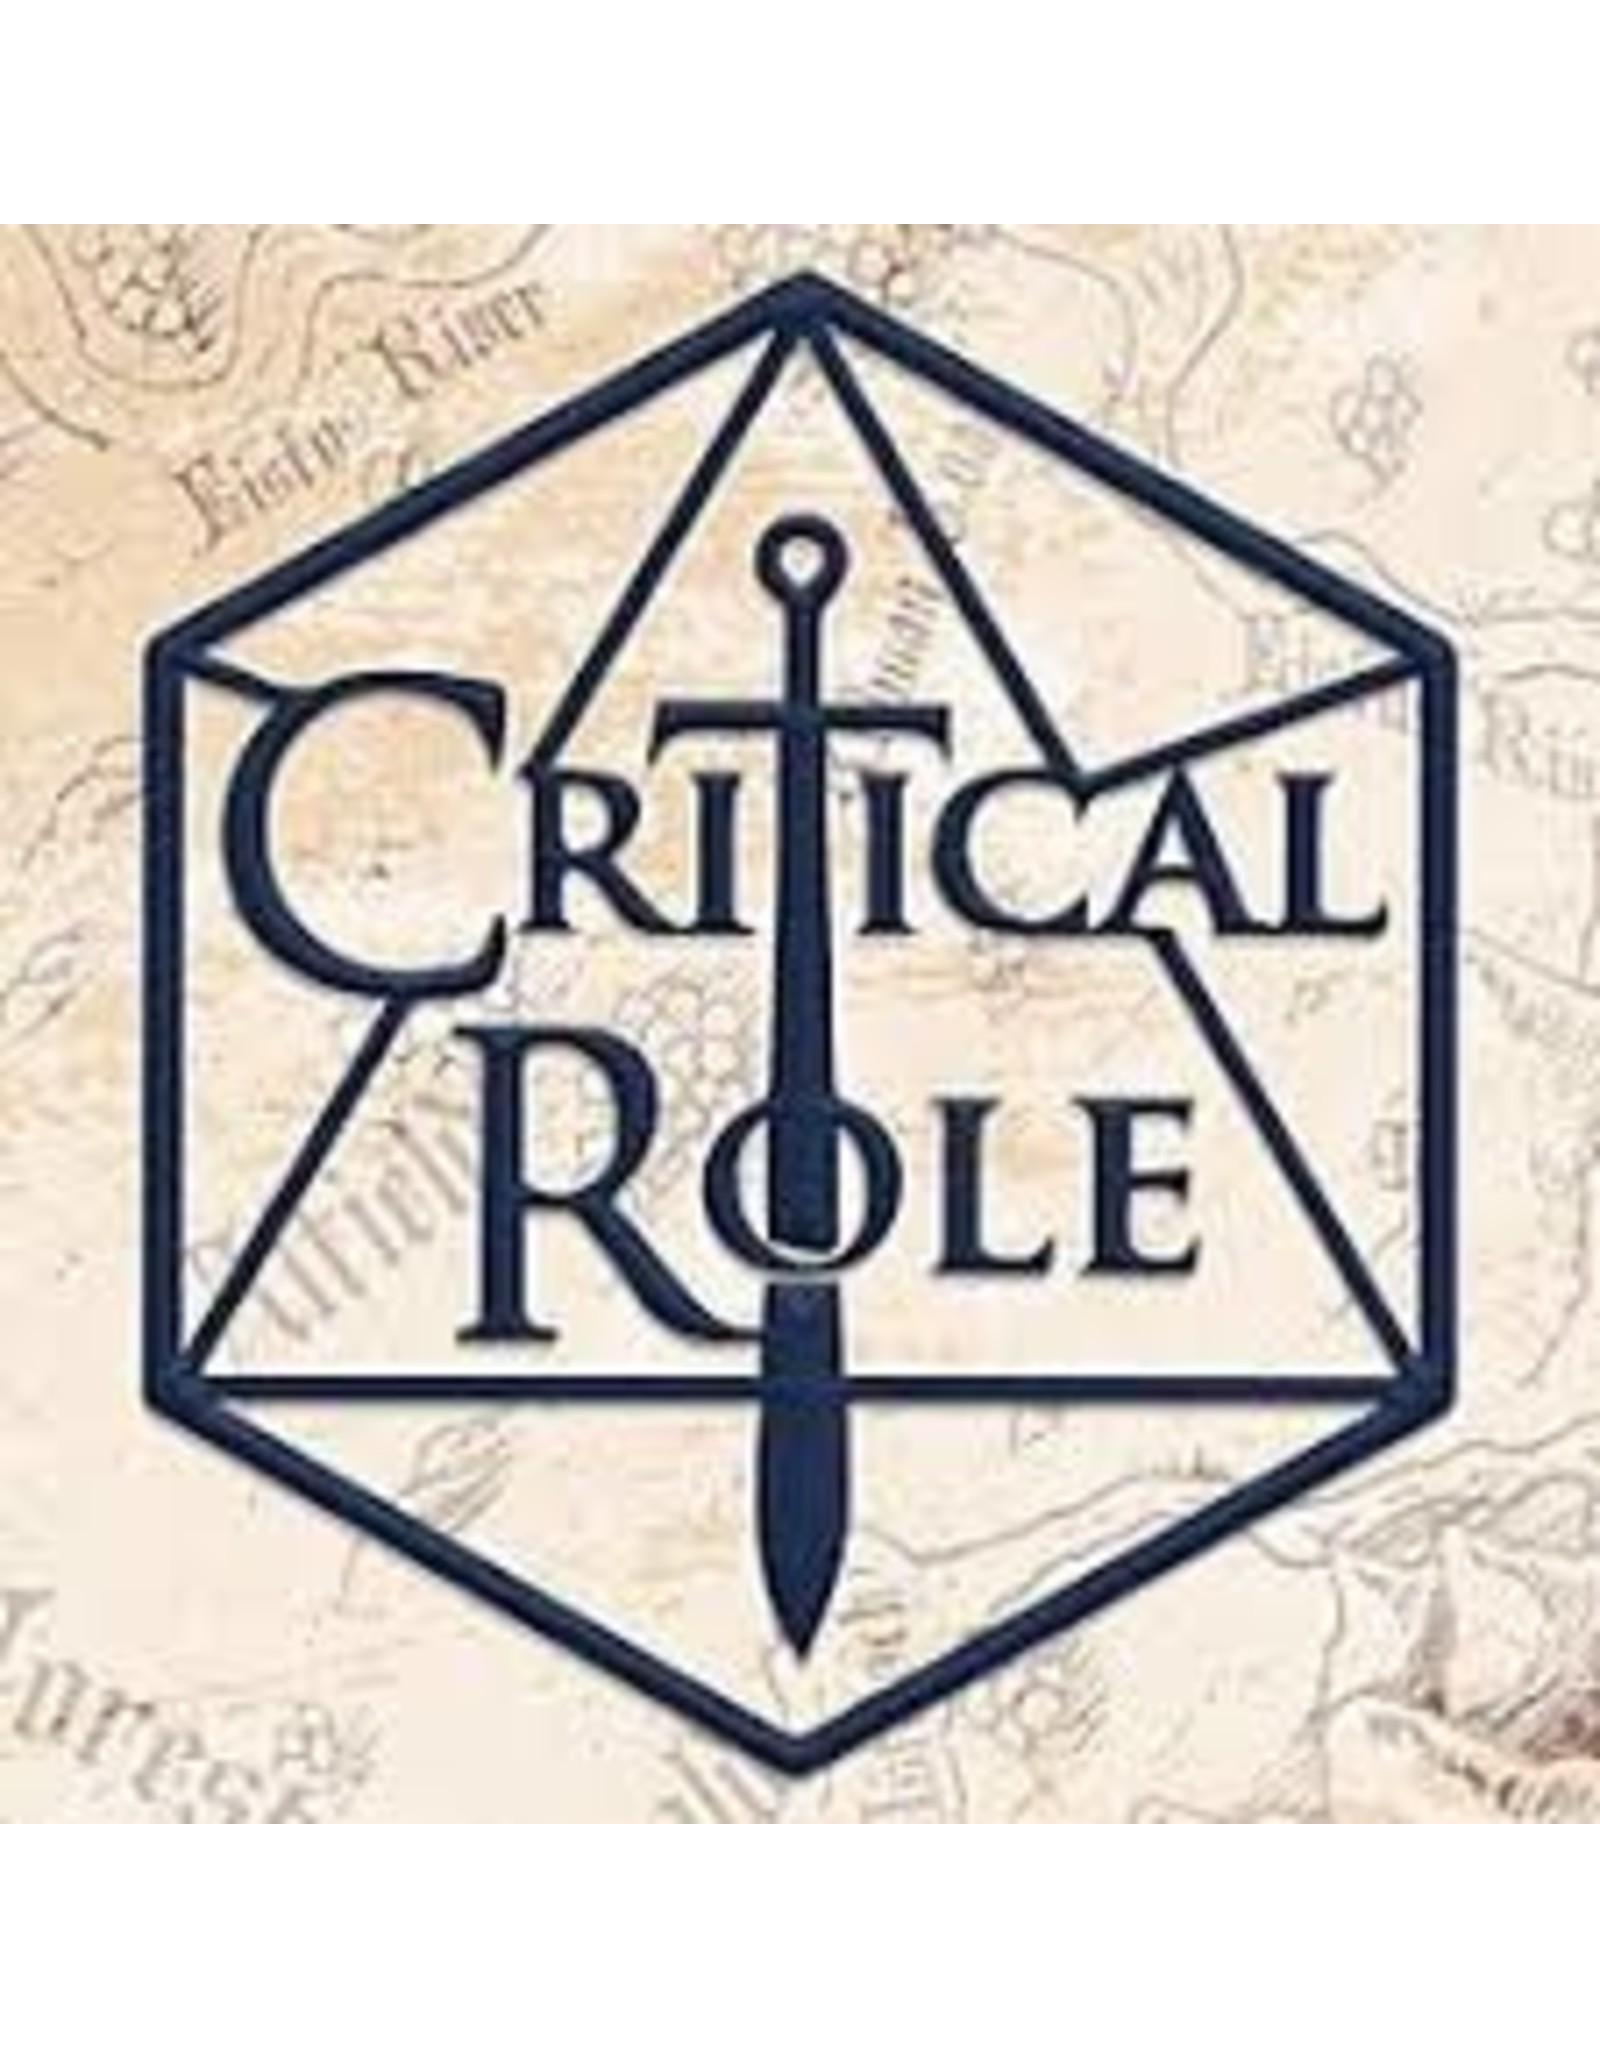 Critical Role Critical Role Chibi Pin No. 16 - Vax